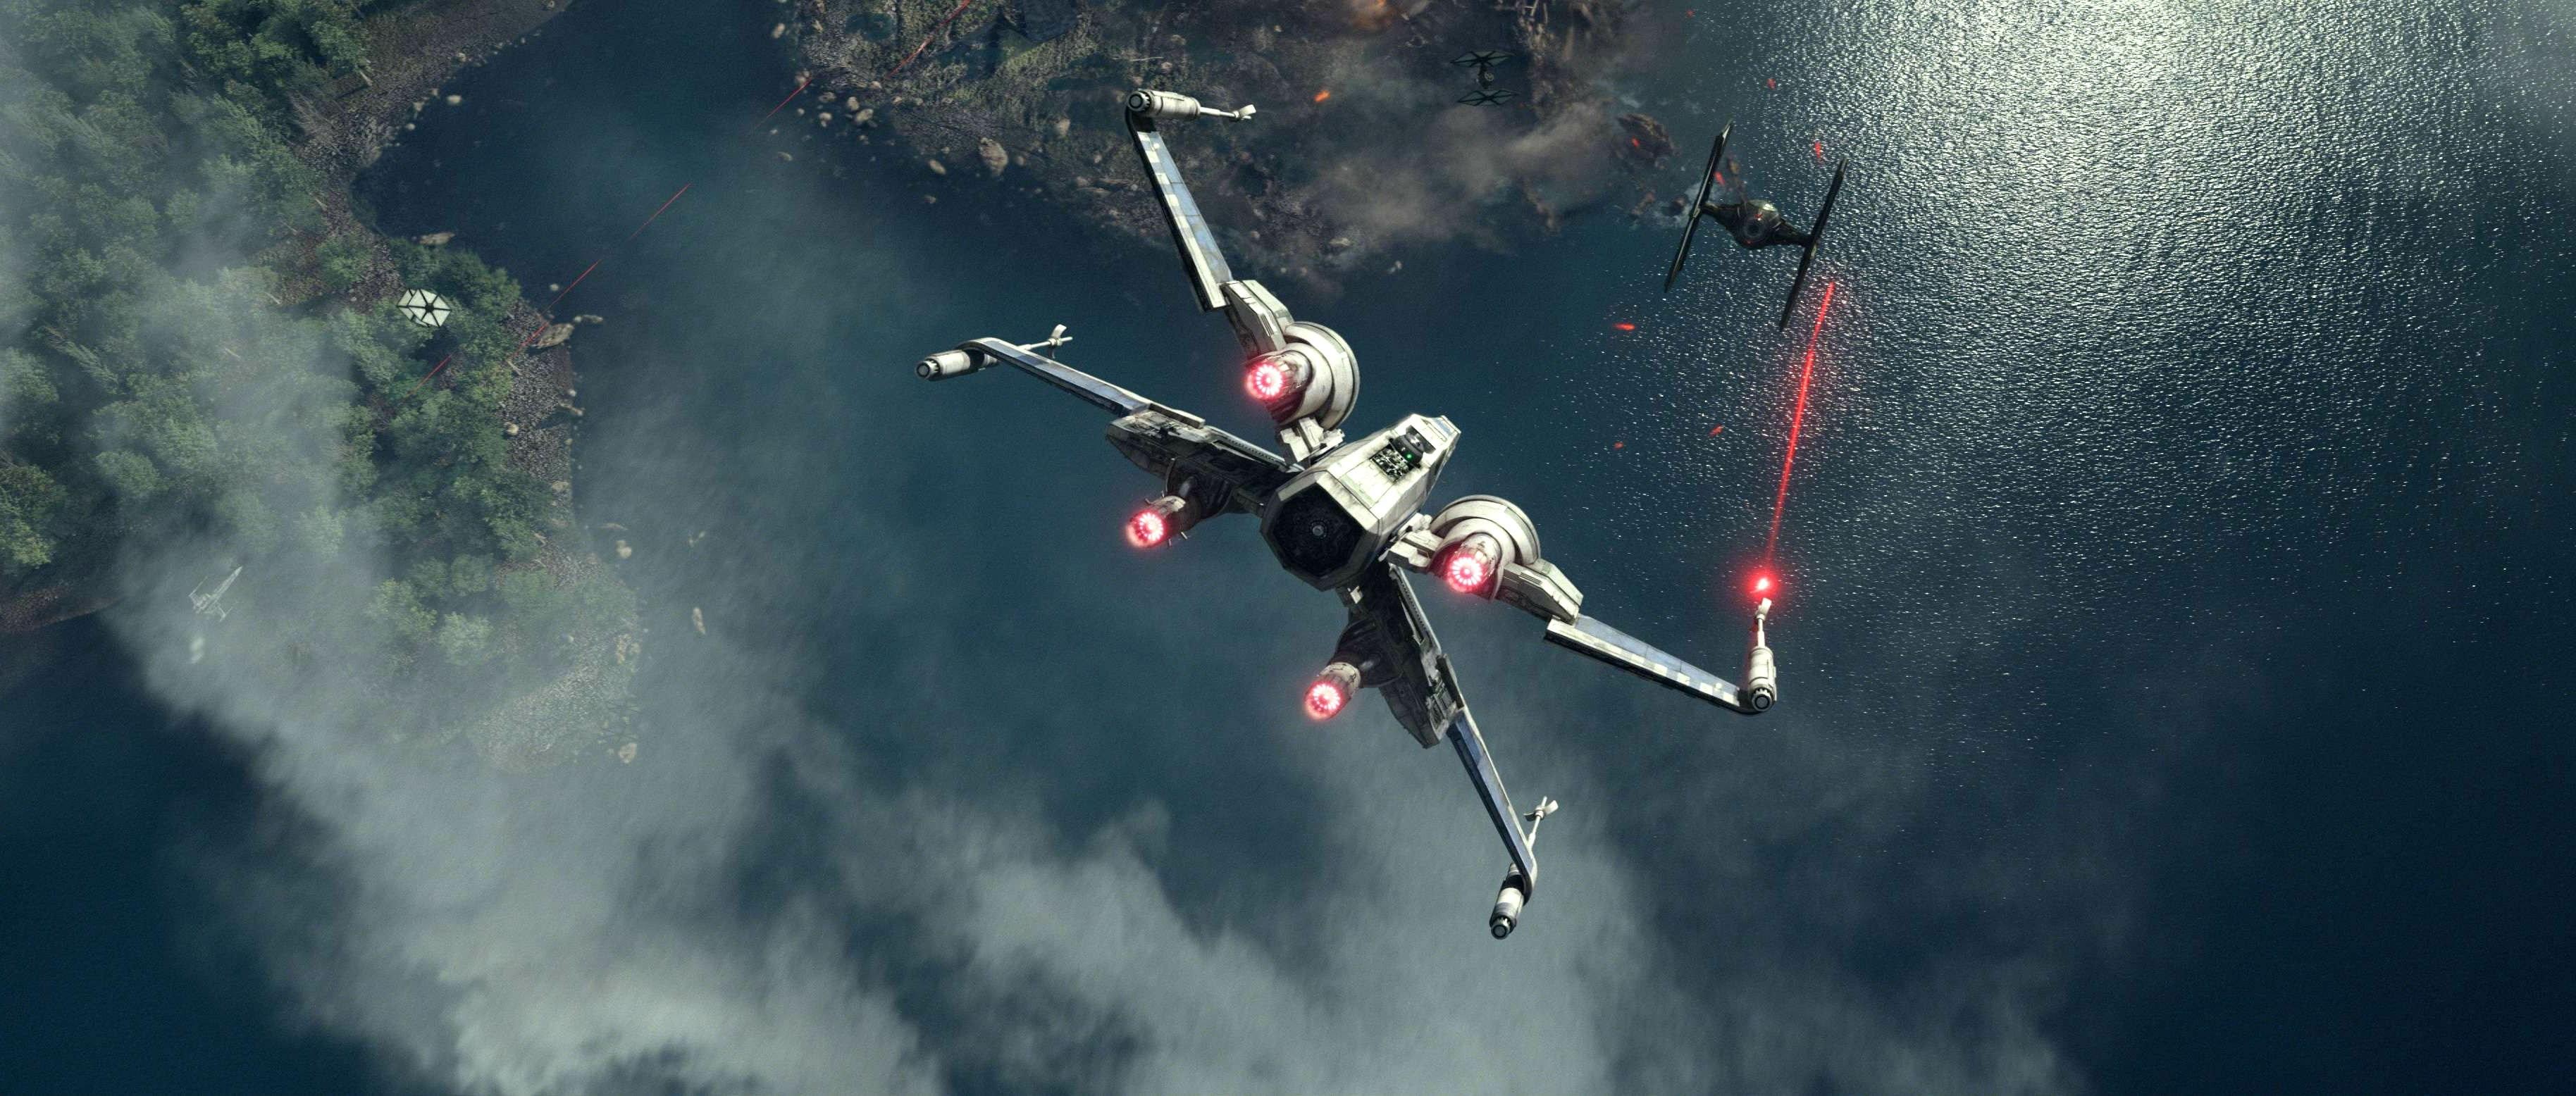 STAR WARS FORCE AWAKENS sci-fi futuristic disney 1star-wars-force-awakens  action adventure spaceship battle wallpaper | | 821384 |  WallpaperUP